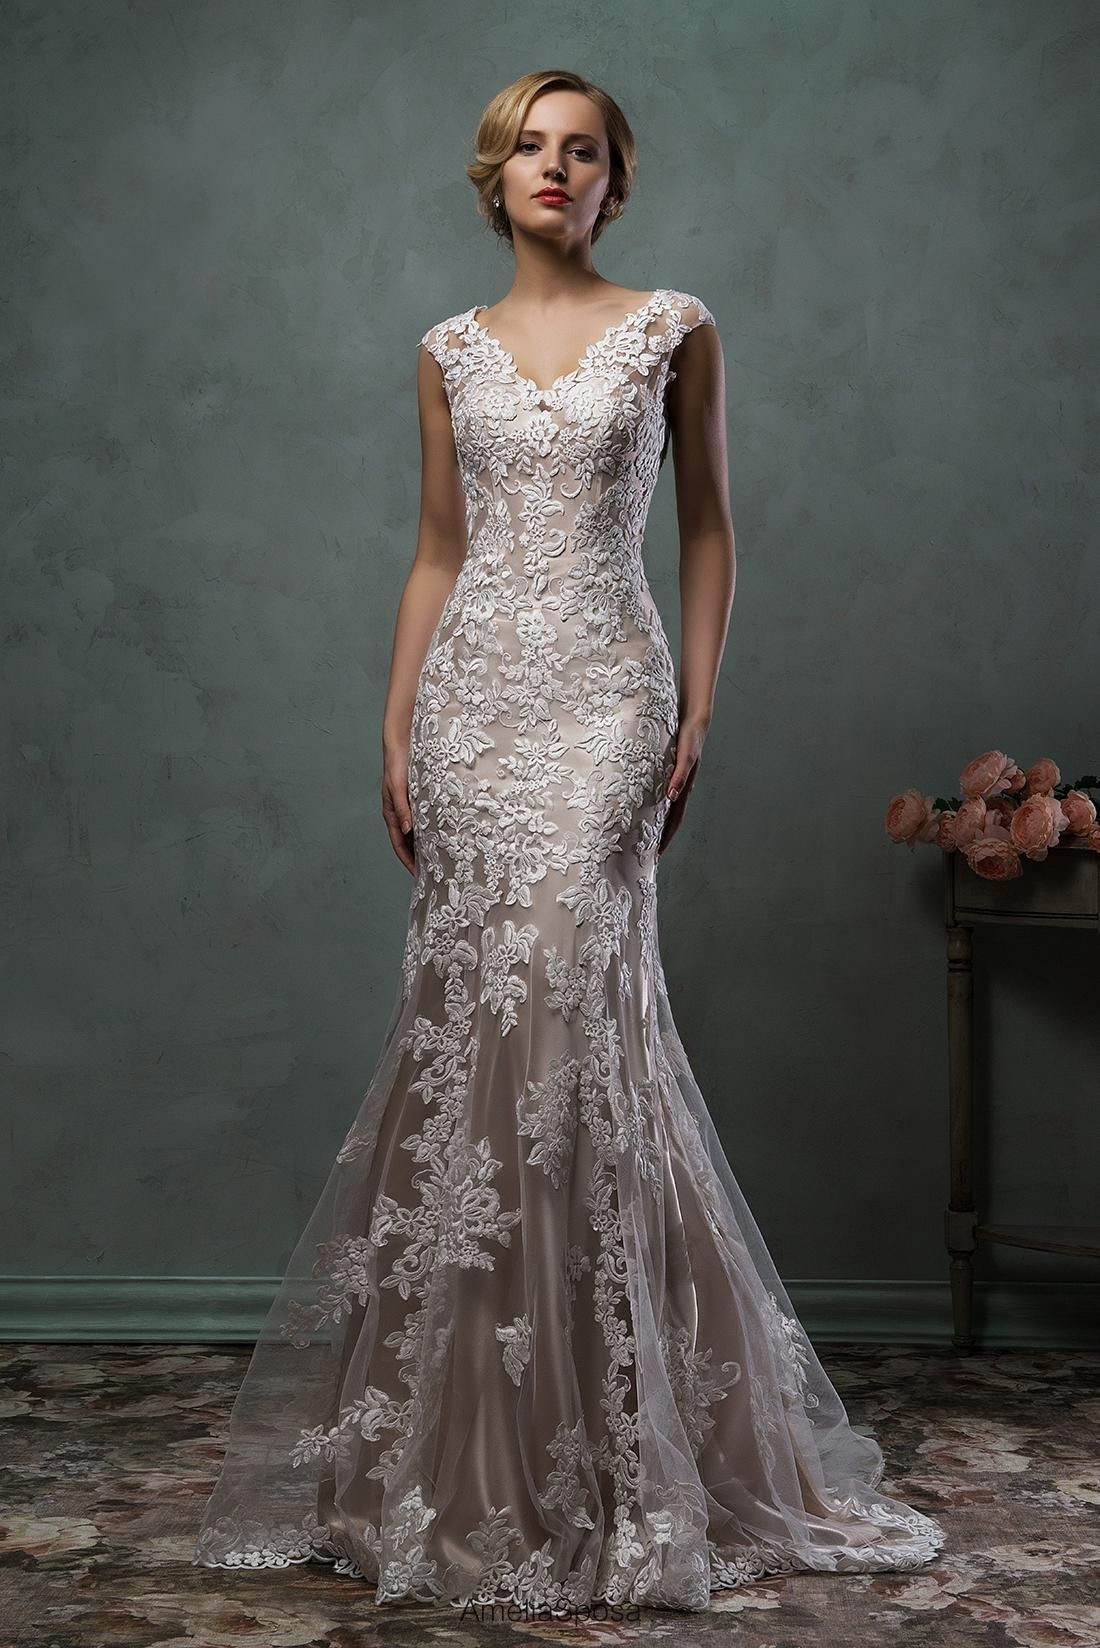 Lace wedding dress amelia sposa wedding dresses with cap